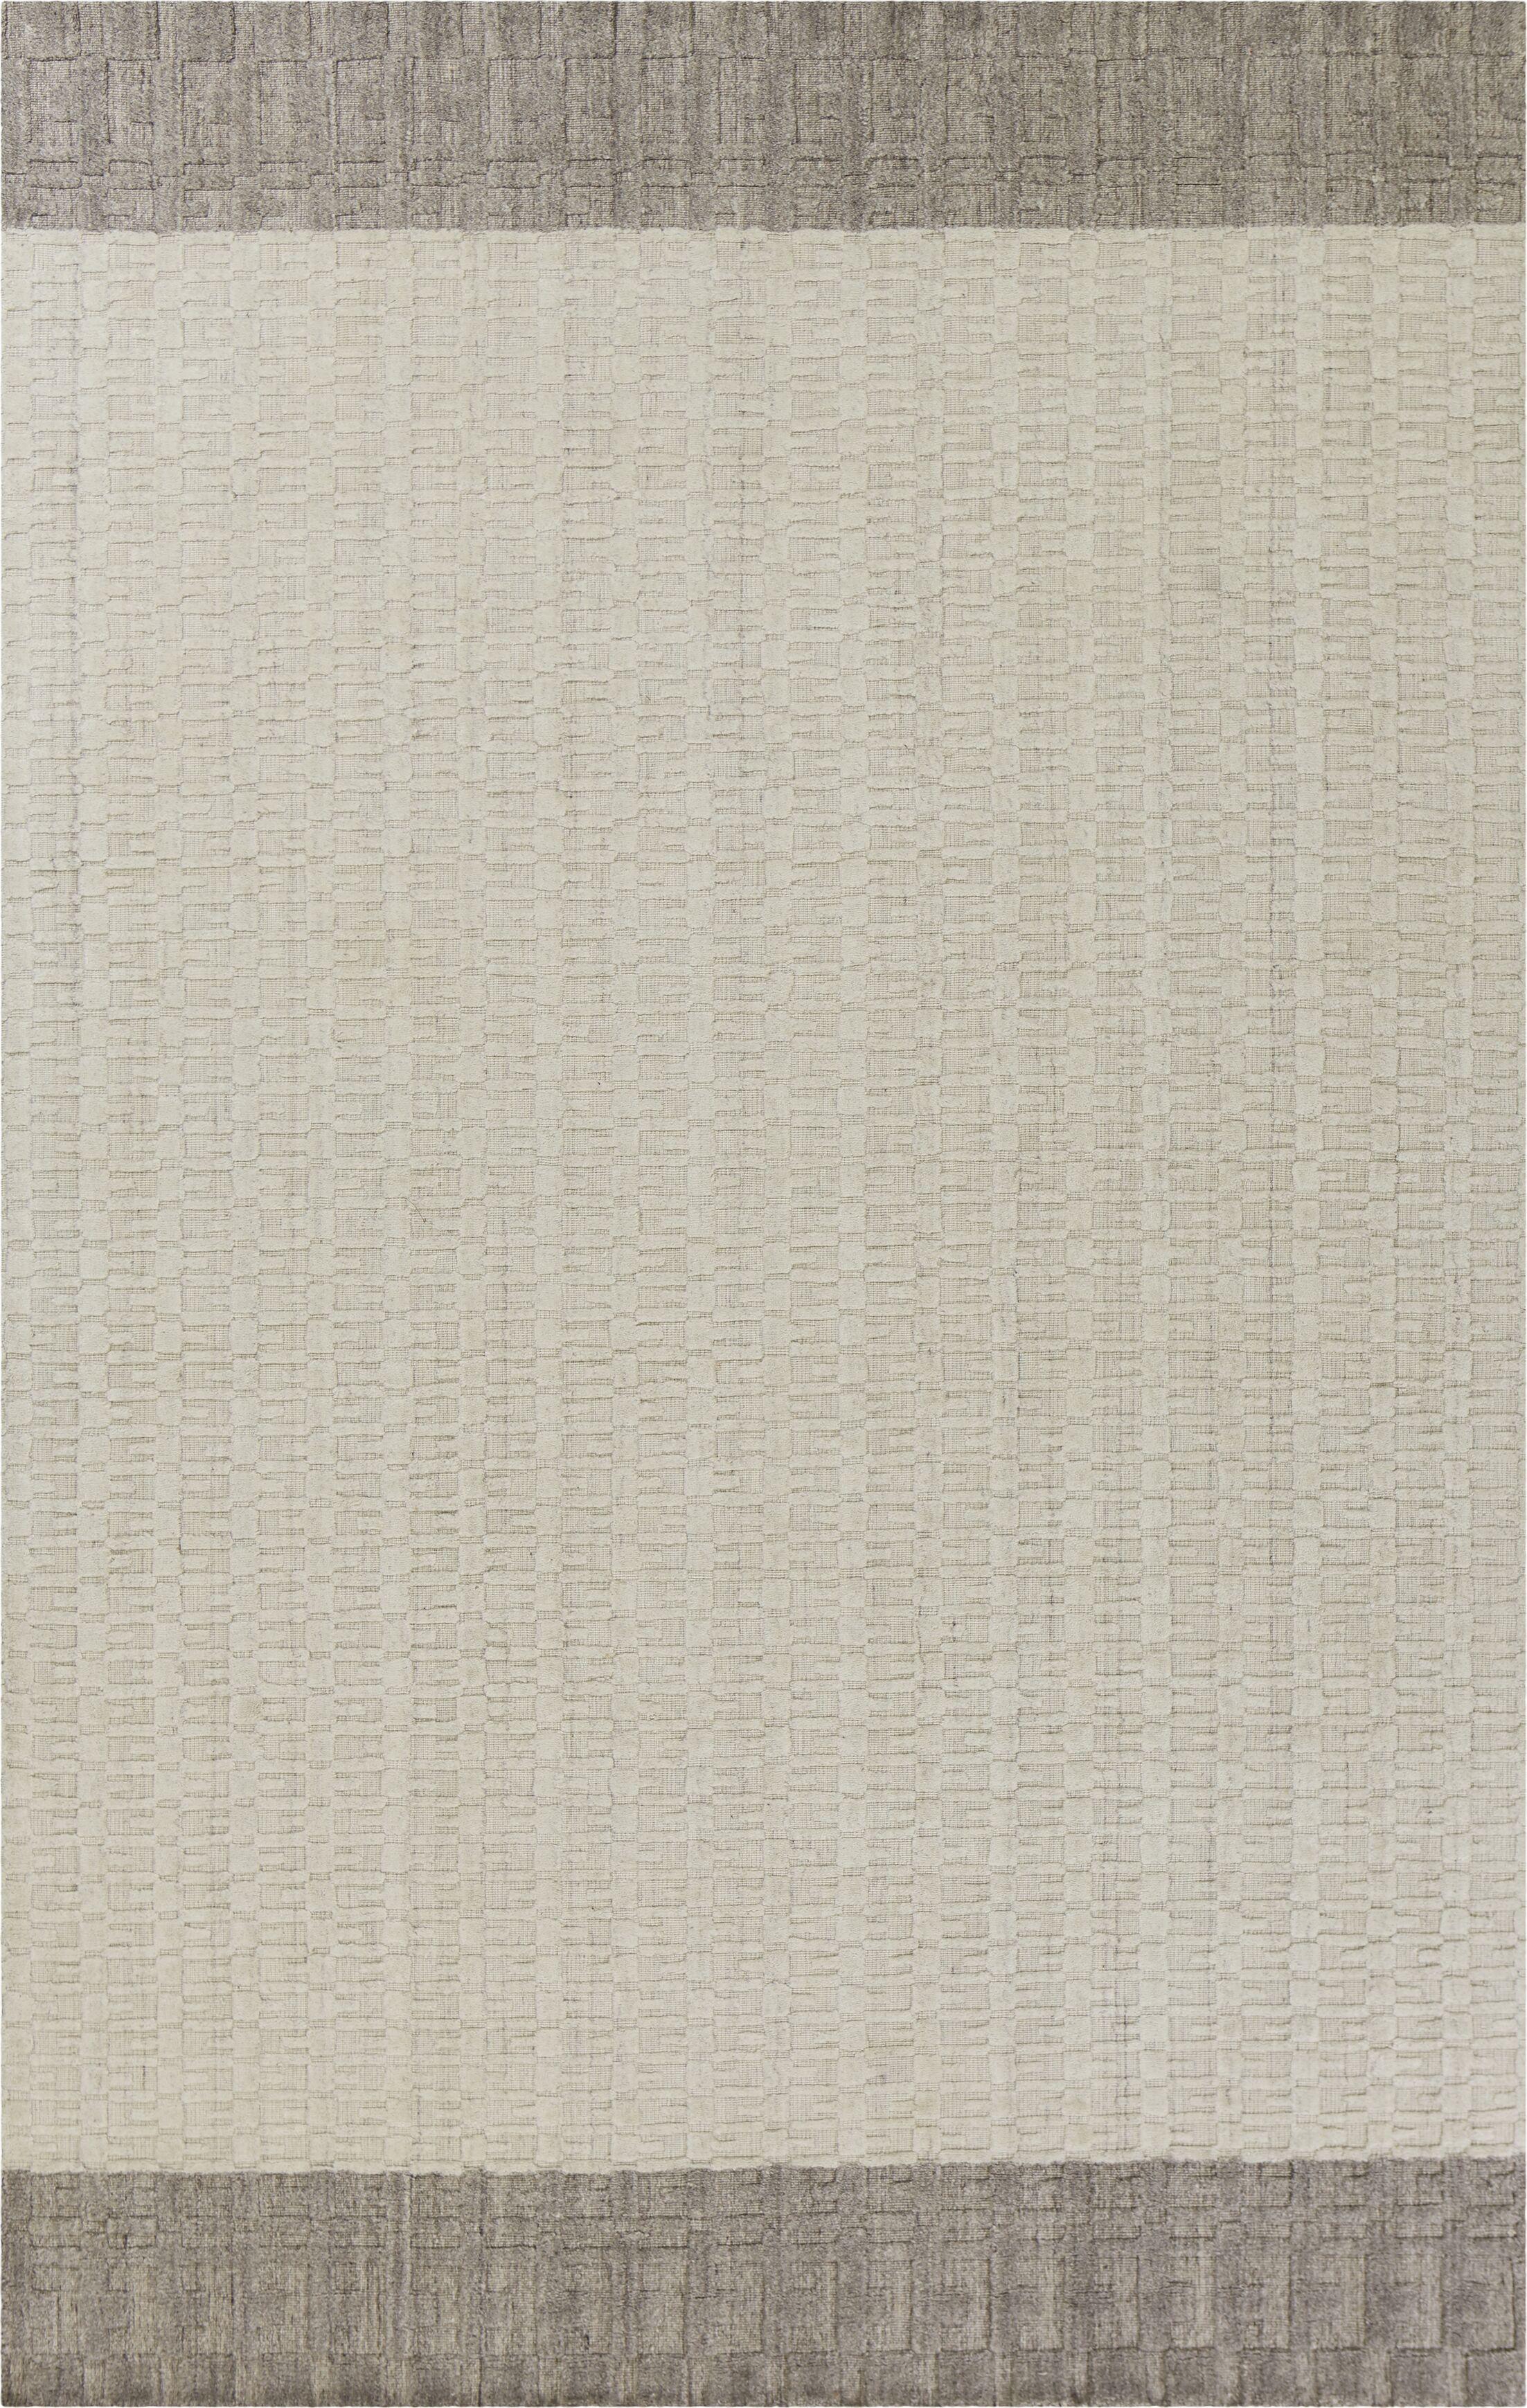 Arroyo Hand-Woven Gray Area Rug Rug Size: Rectangle 8' x 10'